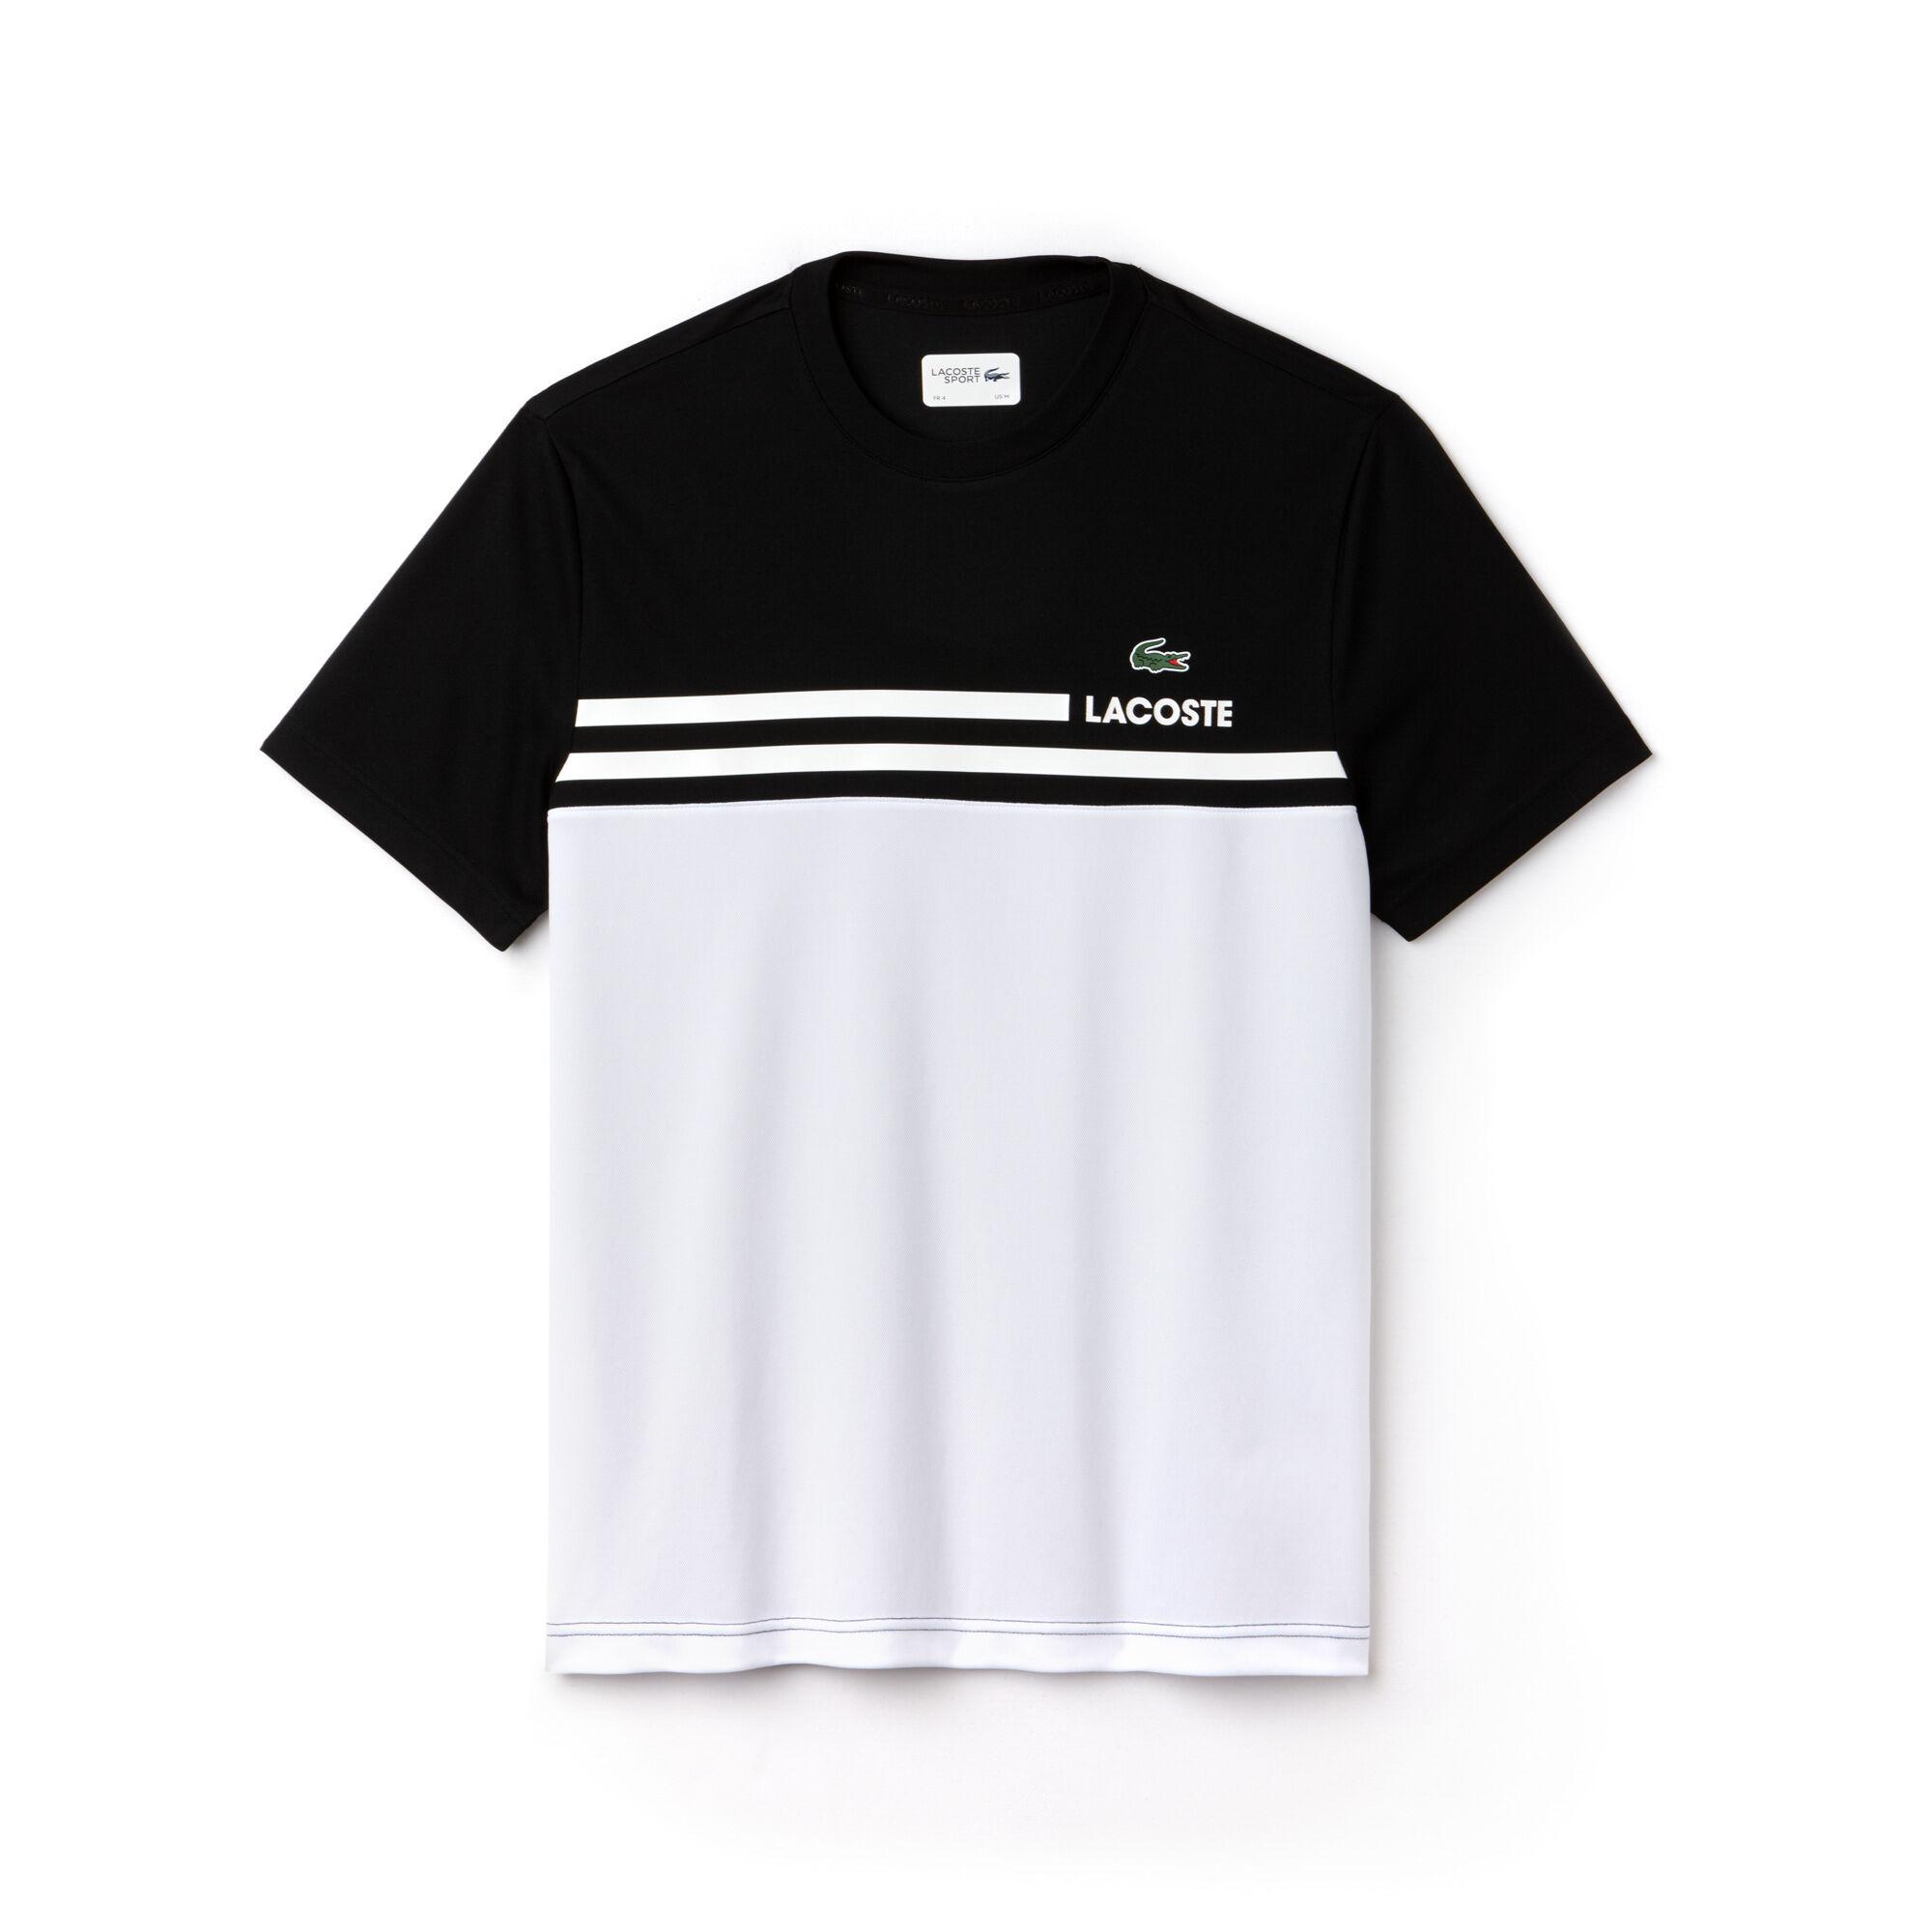 buy lacoste t shirt